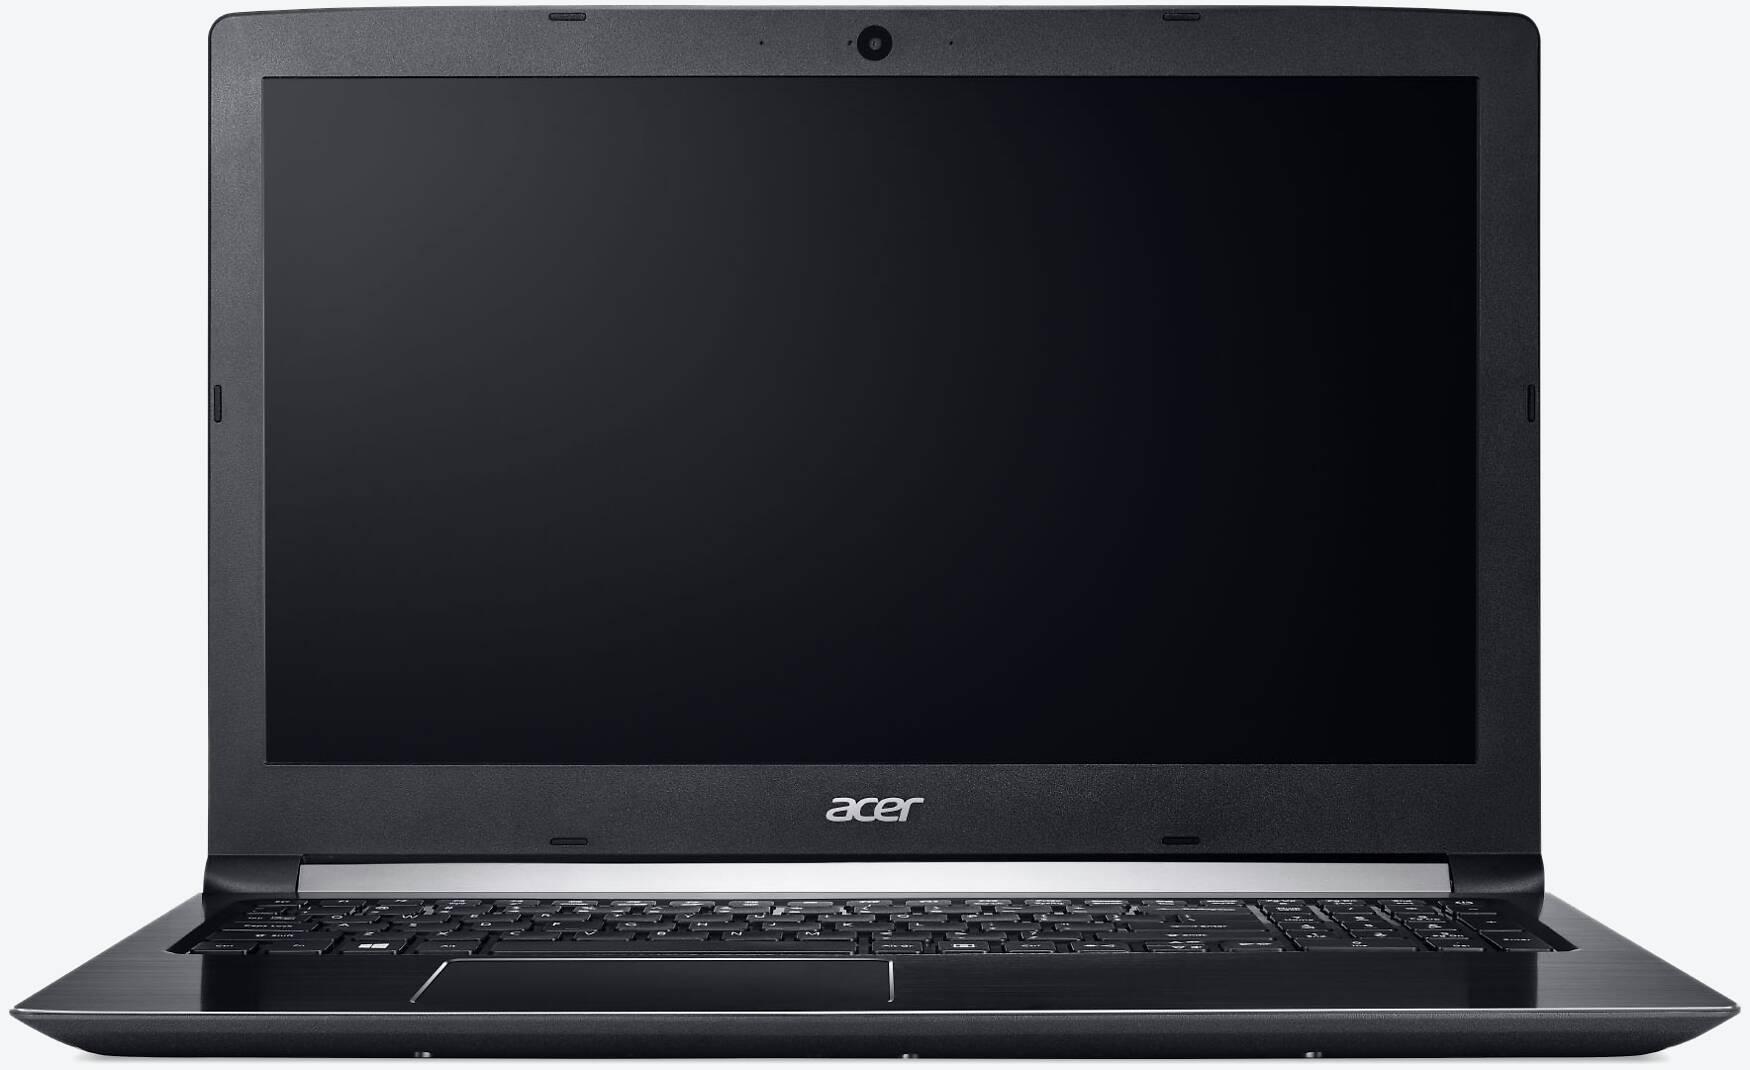 Acer Aspire 5 Pro A517-51P-39J7